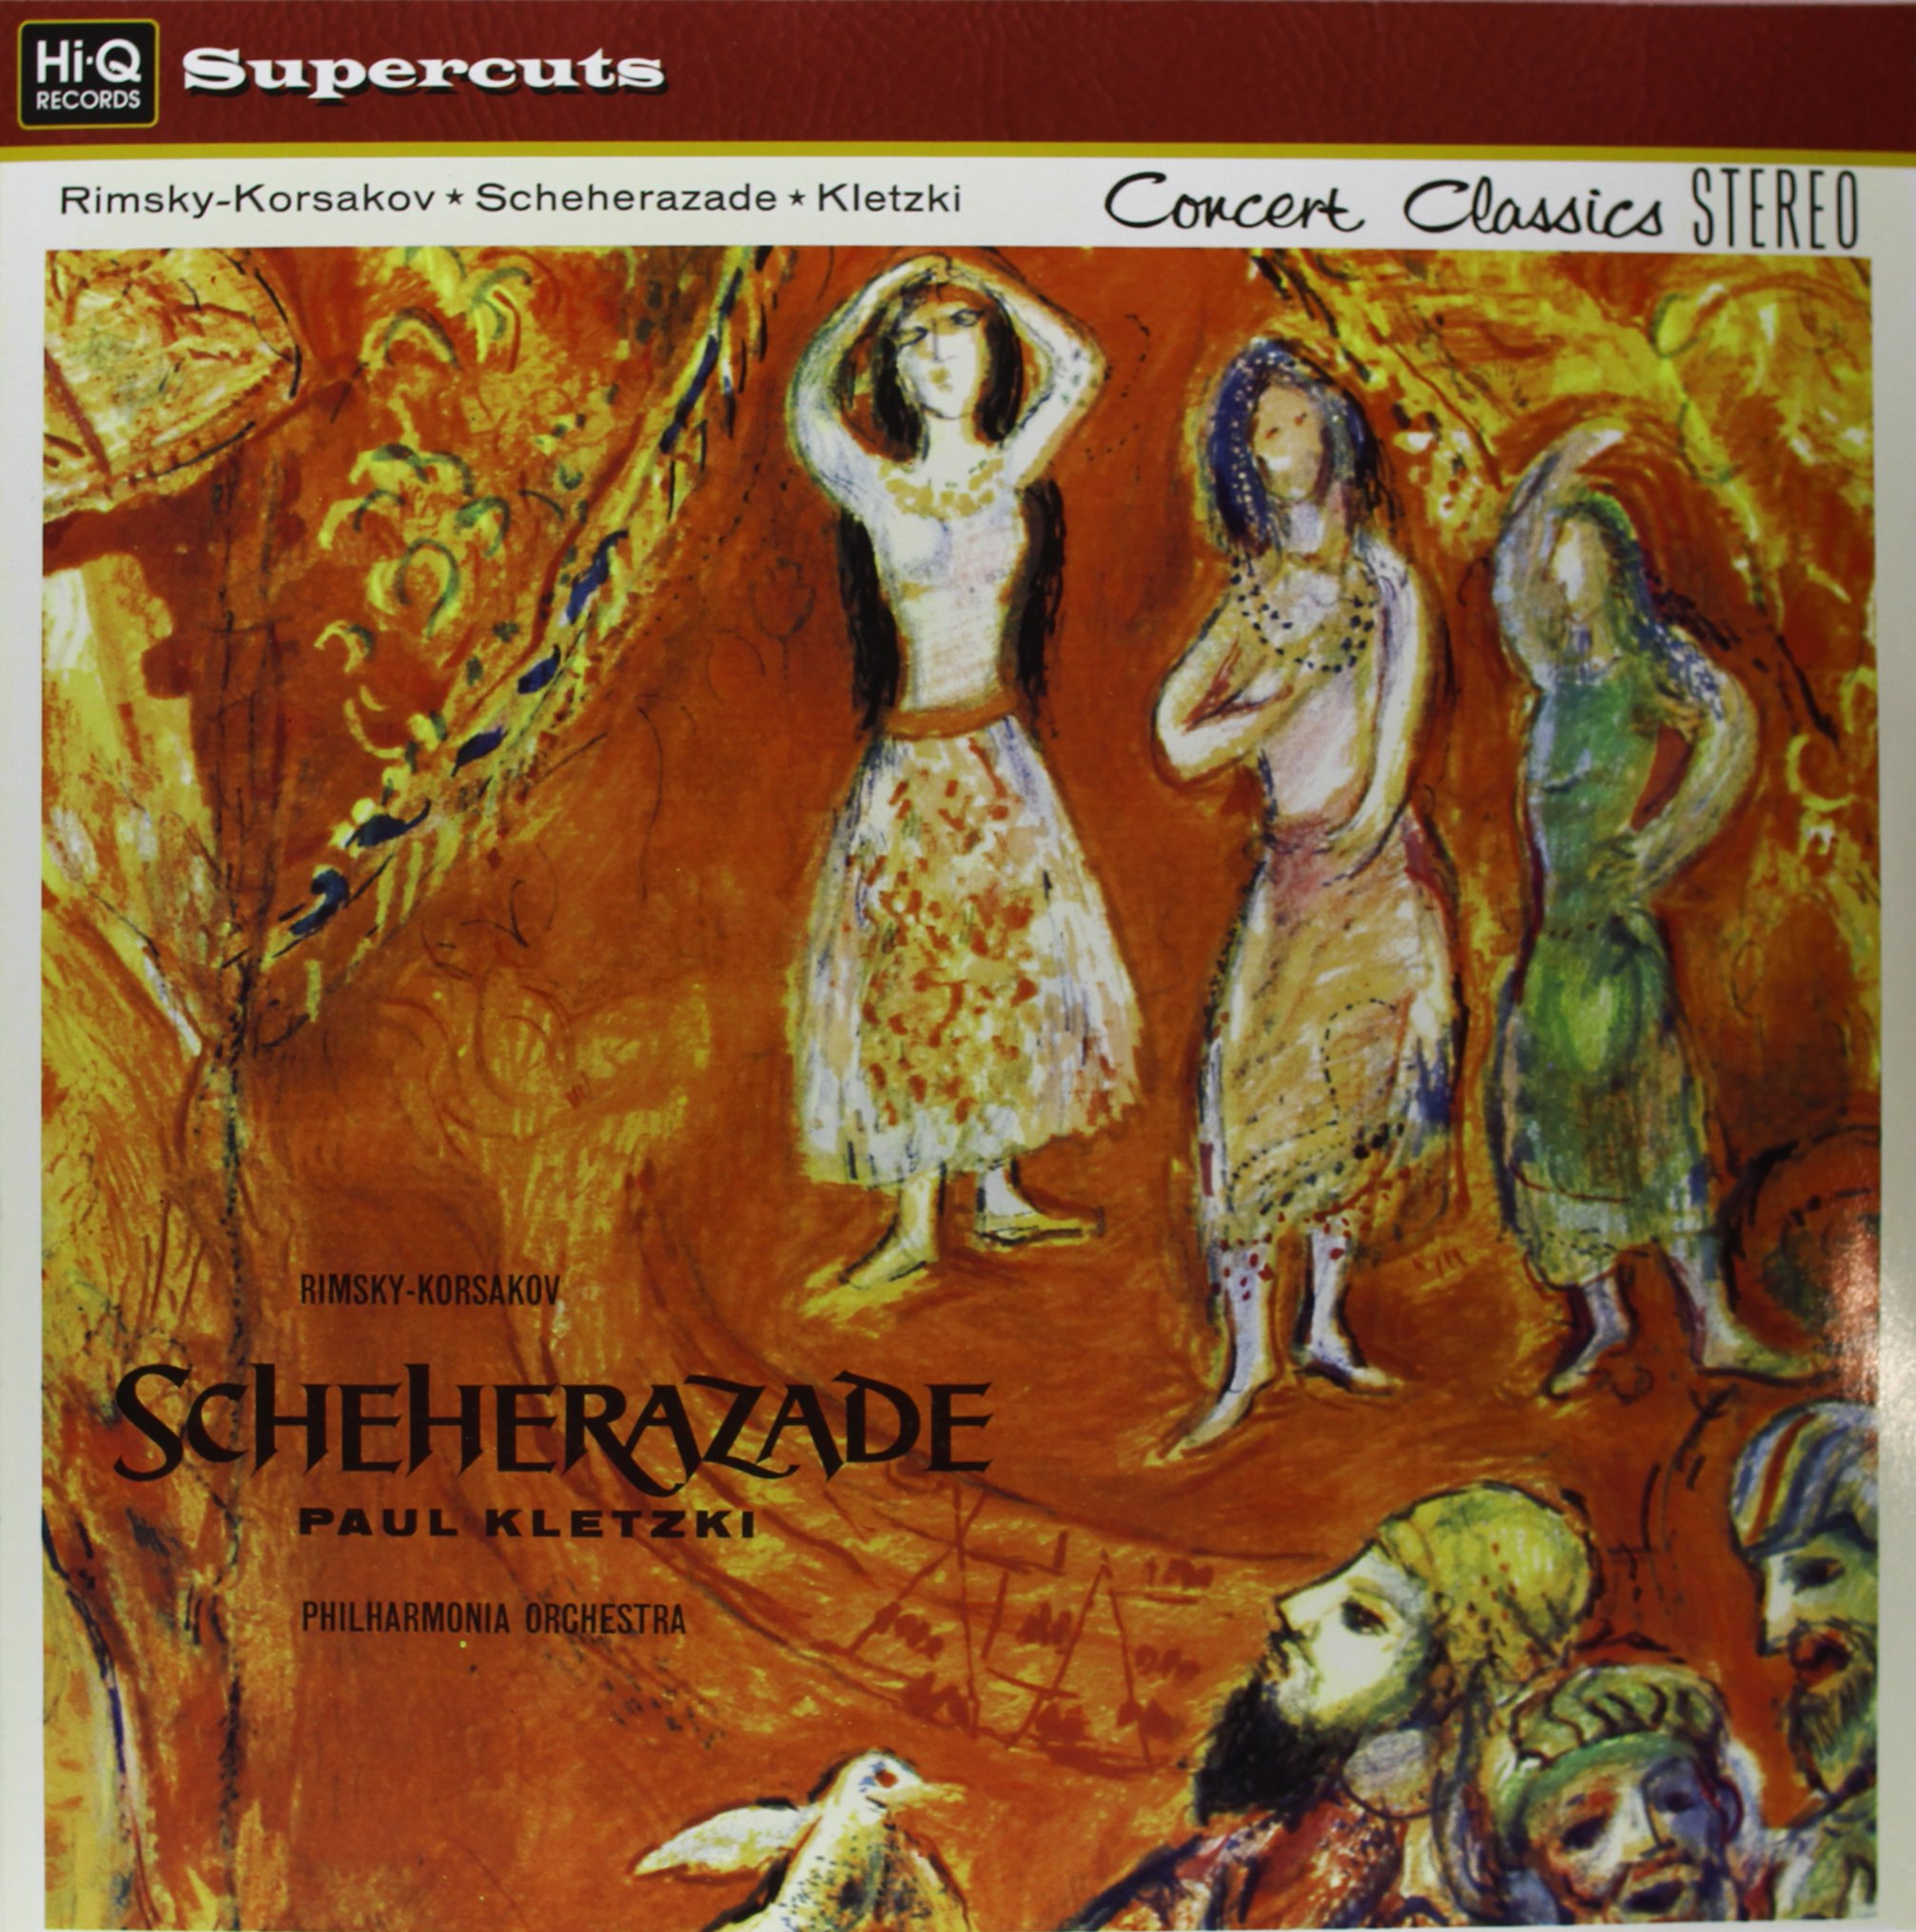 Rimsky-Korsakov Scheherazade by Hi-Q Records